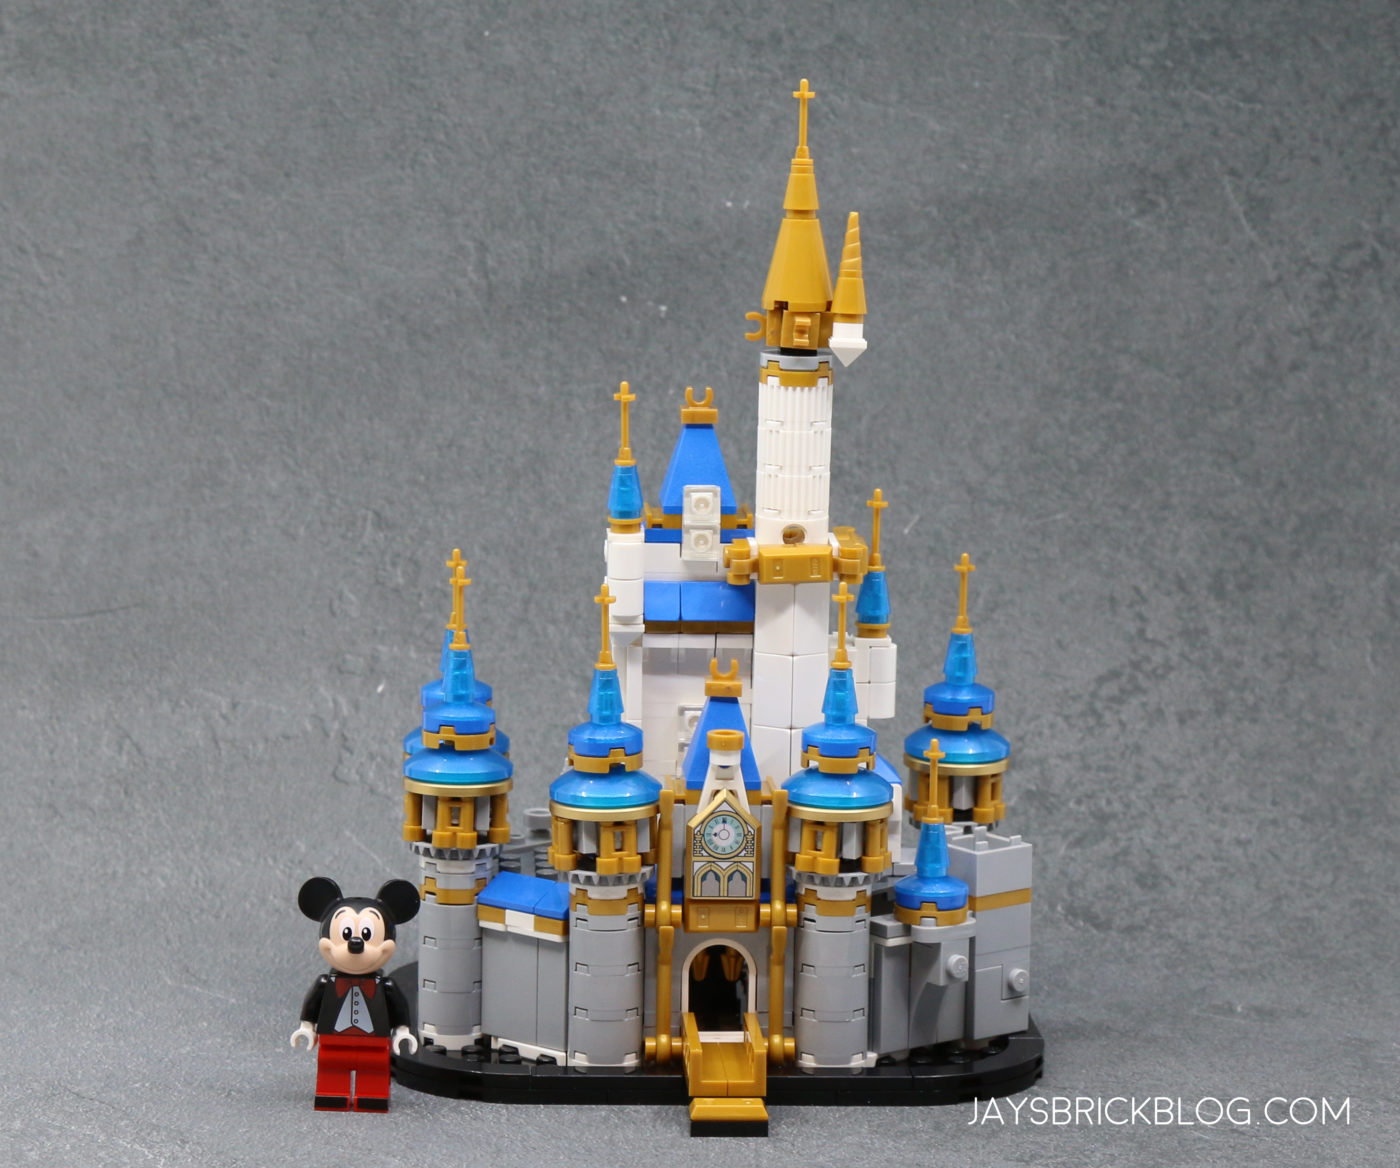 LEGO 40478 Mini Disney Castle 1